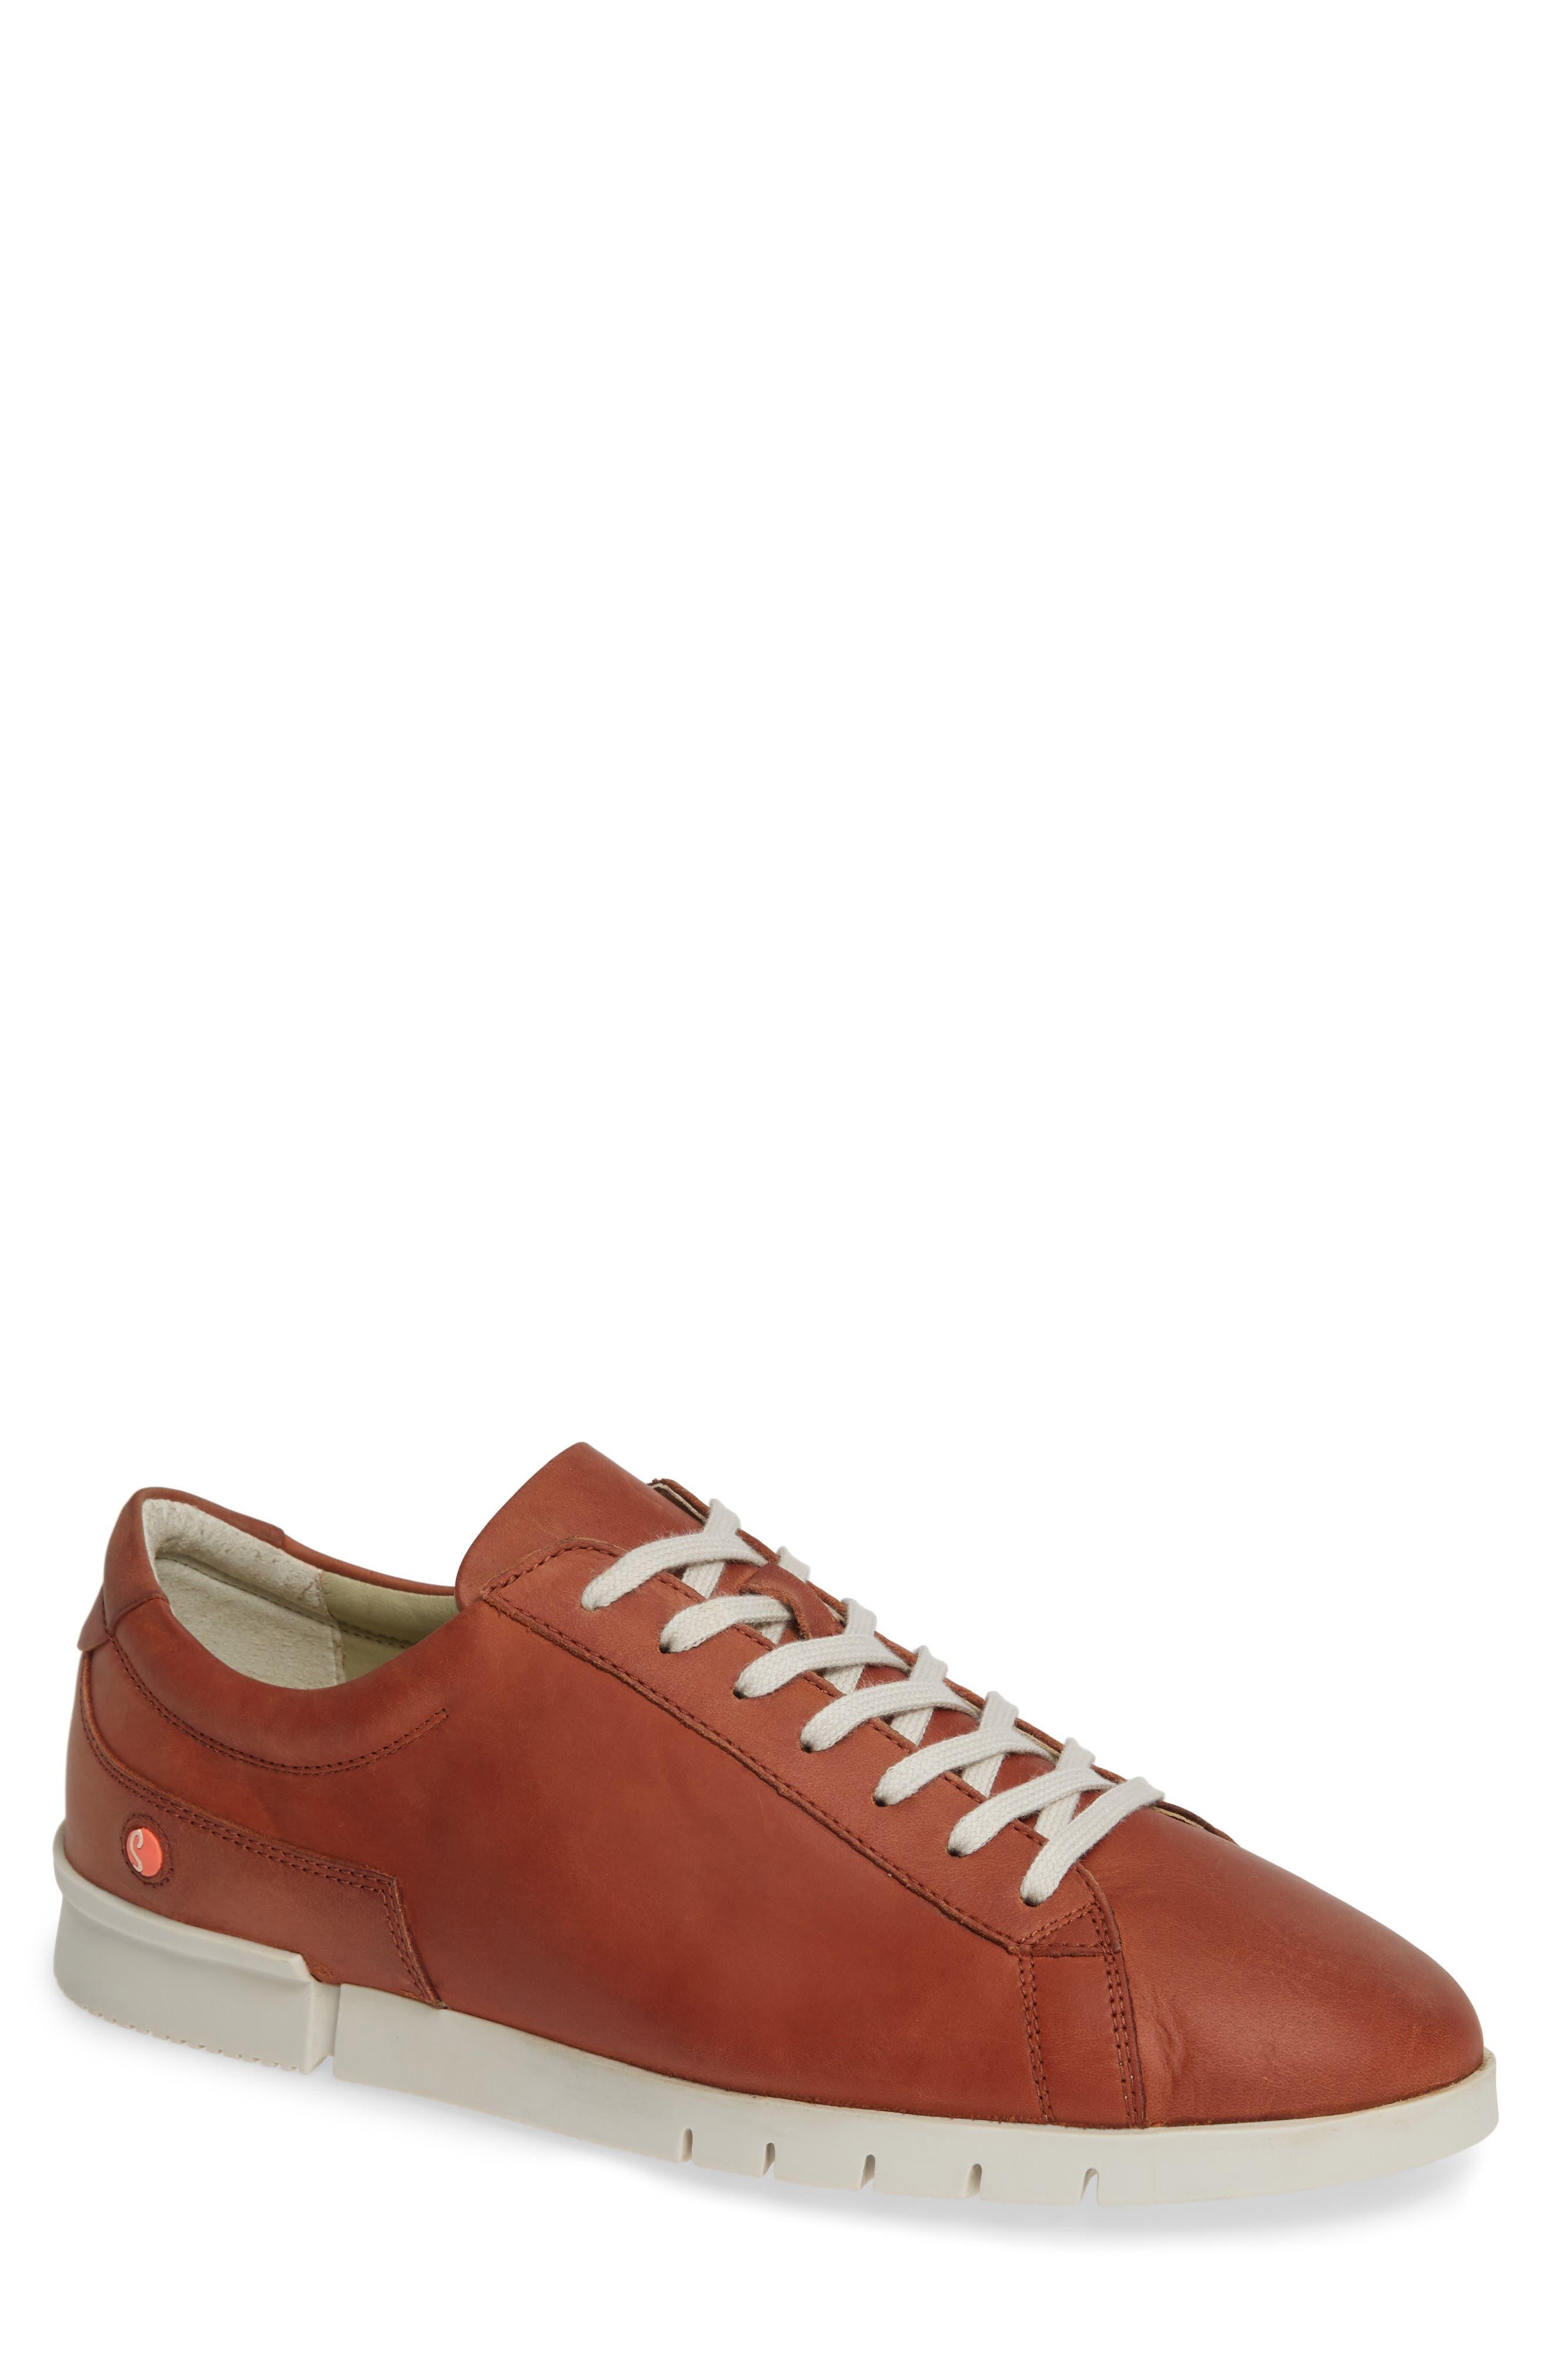 Cer Low-Top Sneaker,                         Main,                         color, COGNAC CORGI LEATHER